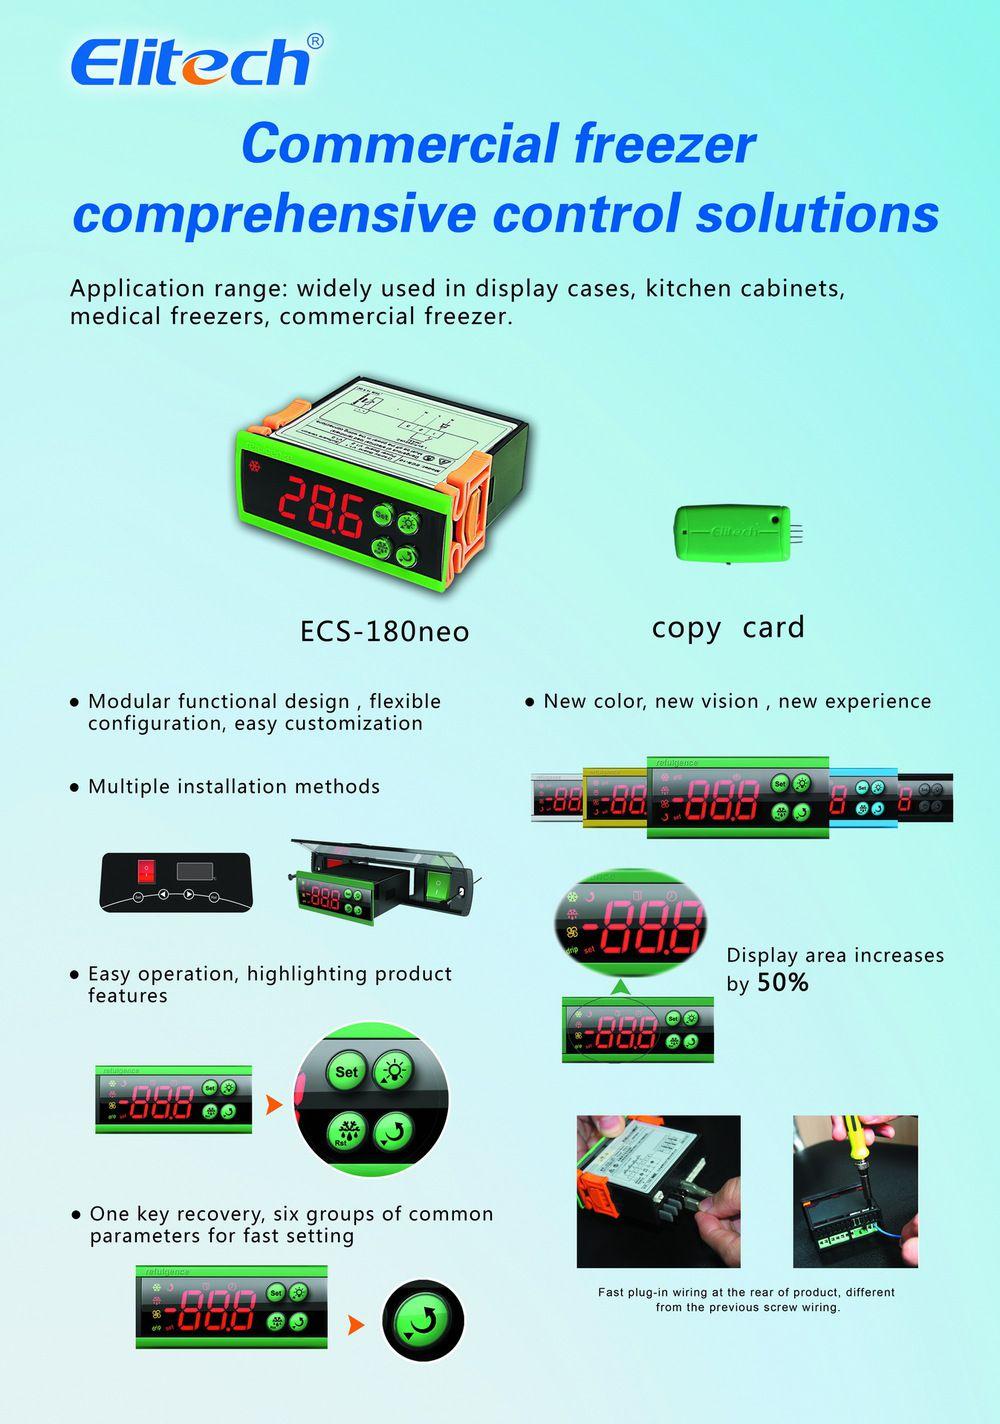 how to set temperature control on ecs-180